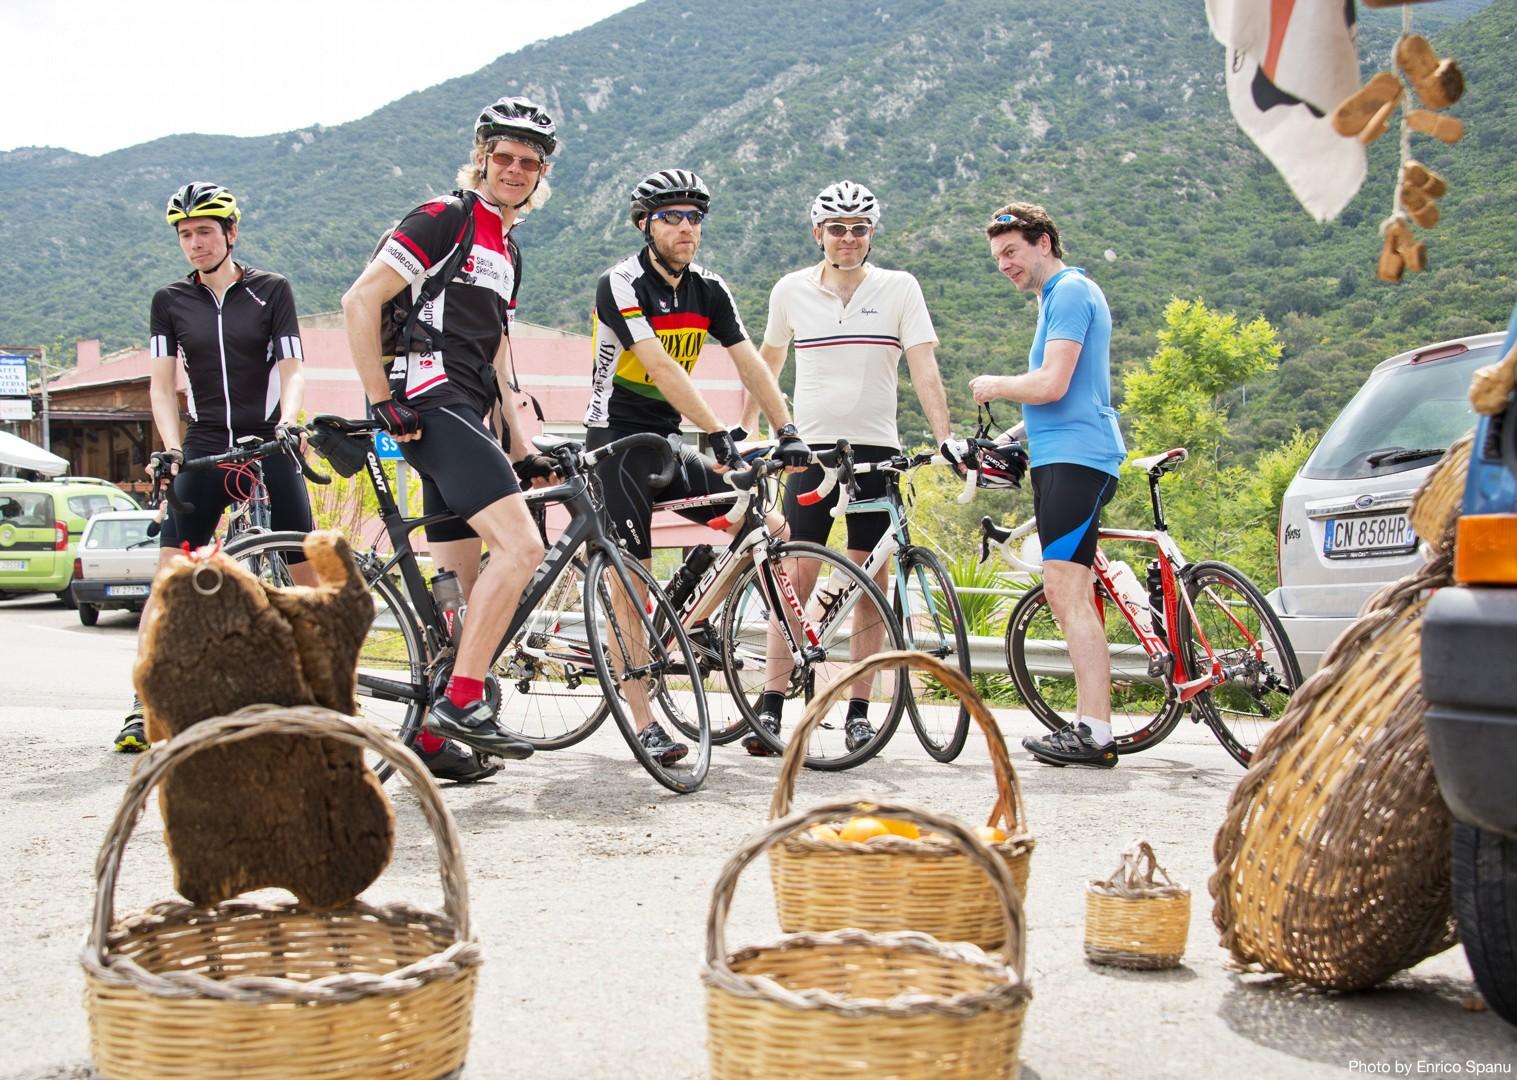 Guided-Road-Cycling-Holiday-Sardinia-Sardinian-Mountains.jpg - Italy - Sardinia - Sardinian Mountains - Guided Road Cycling Holiday - Italia Road Cycling